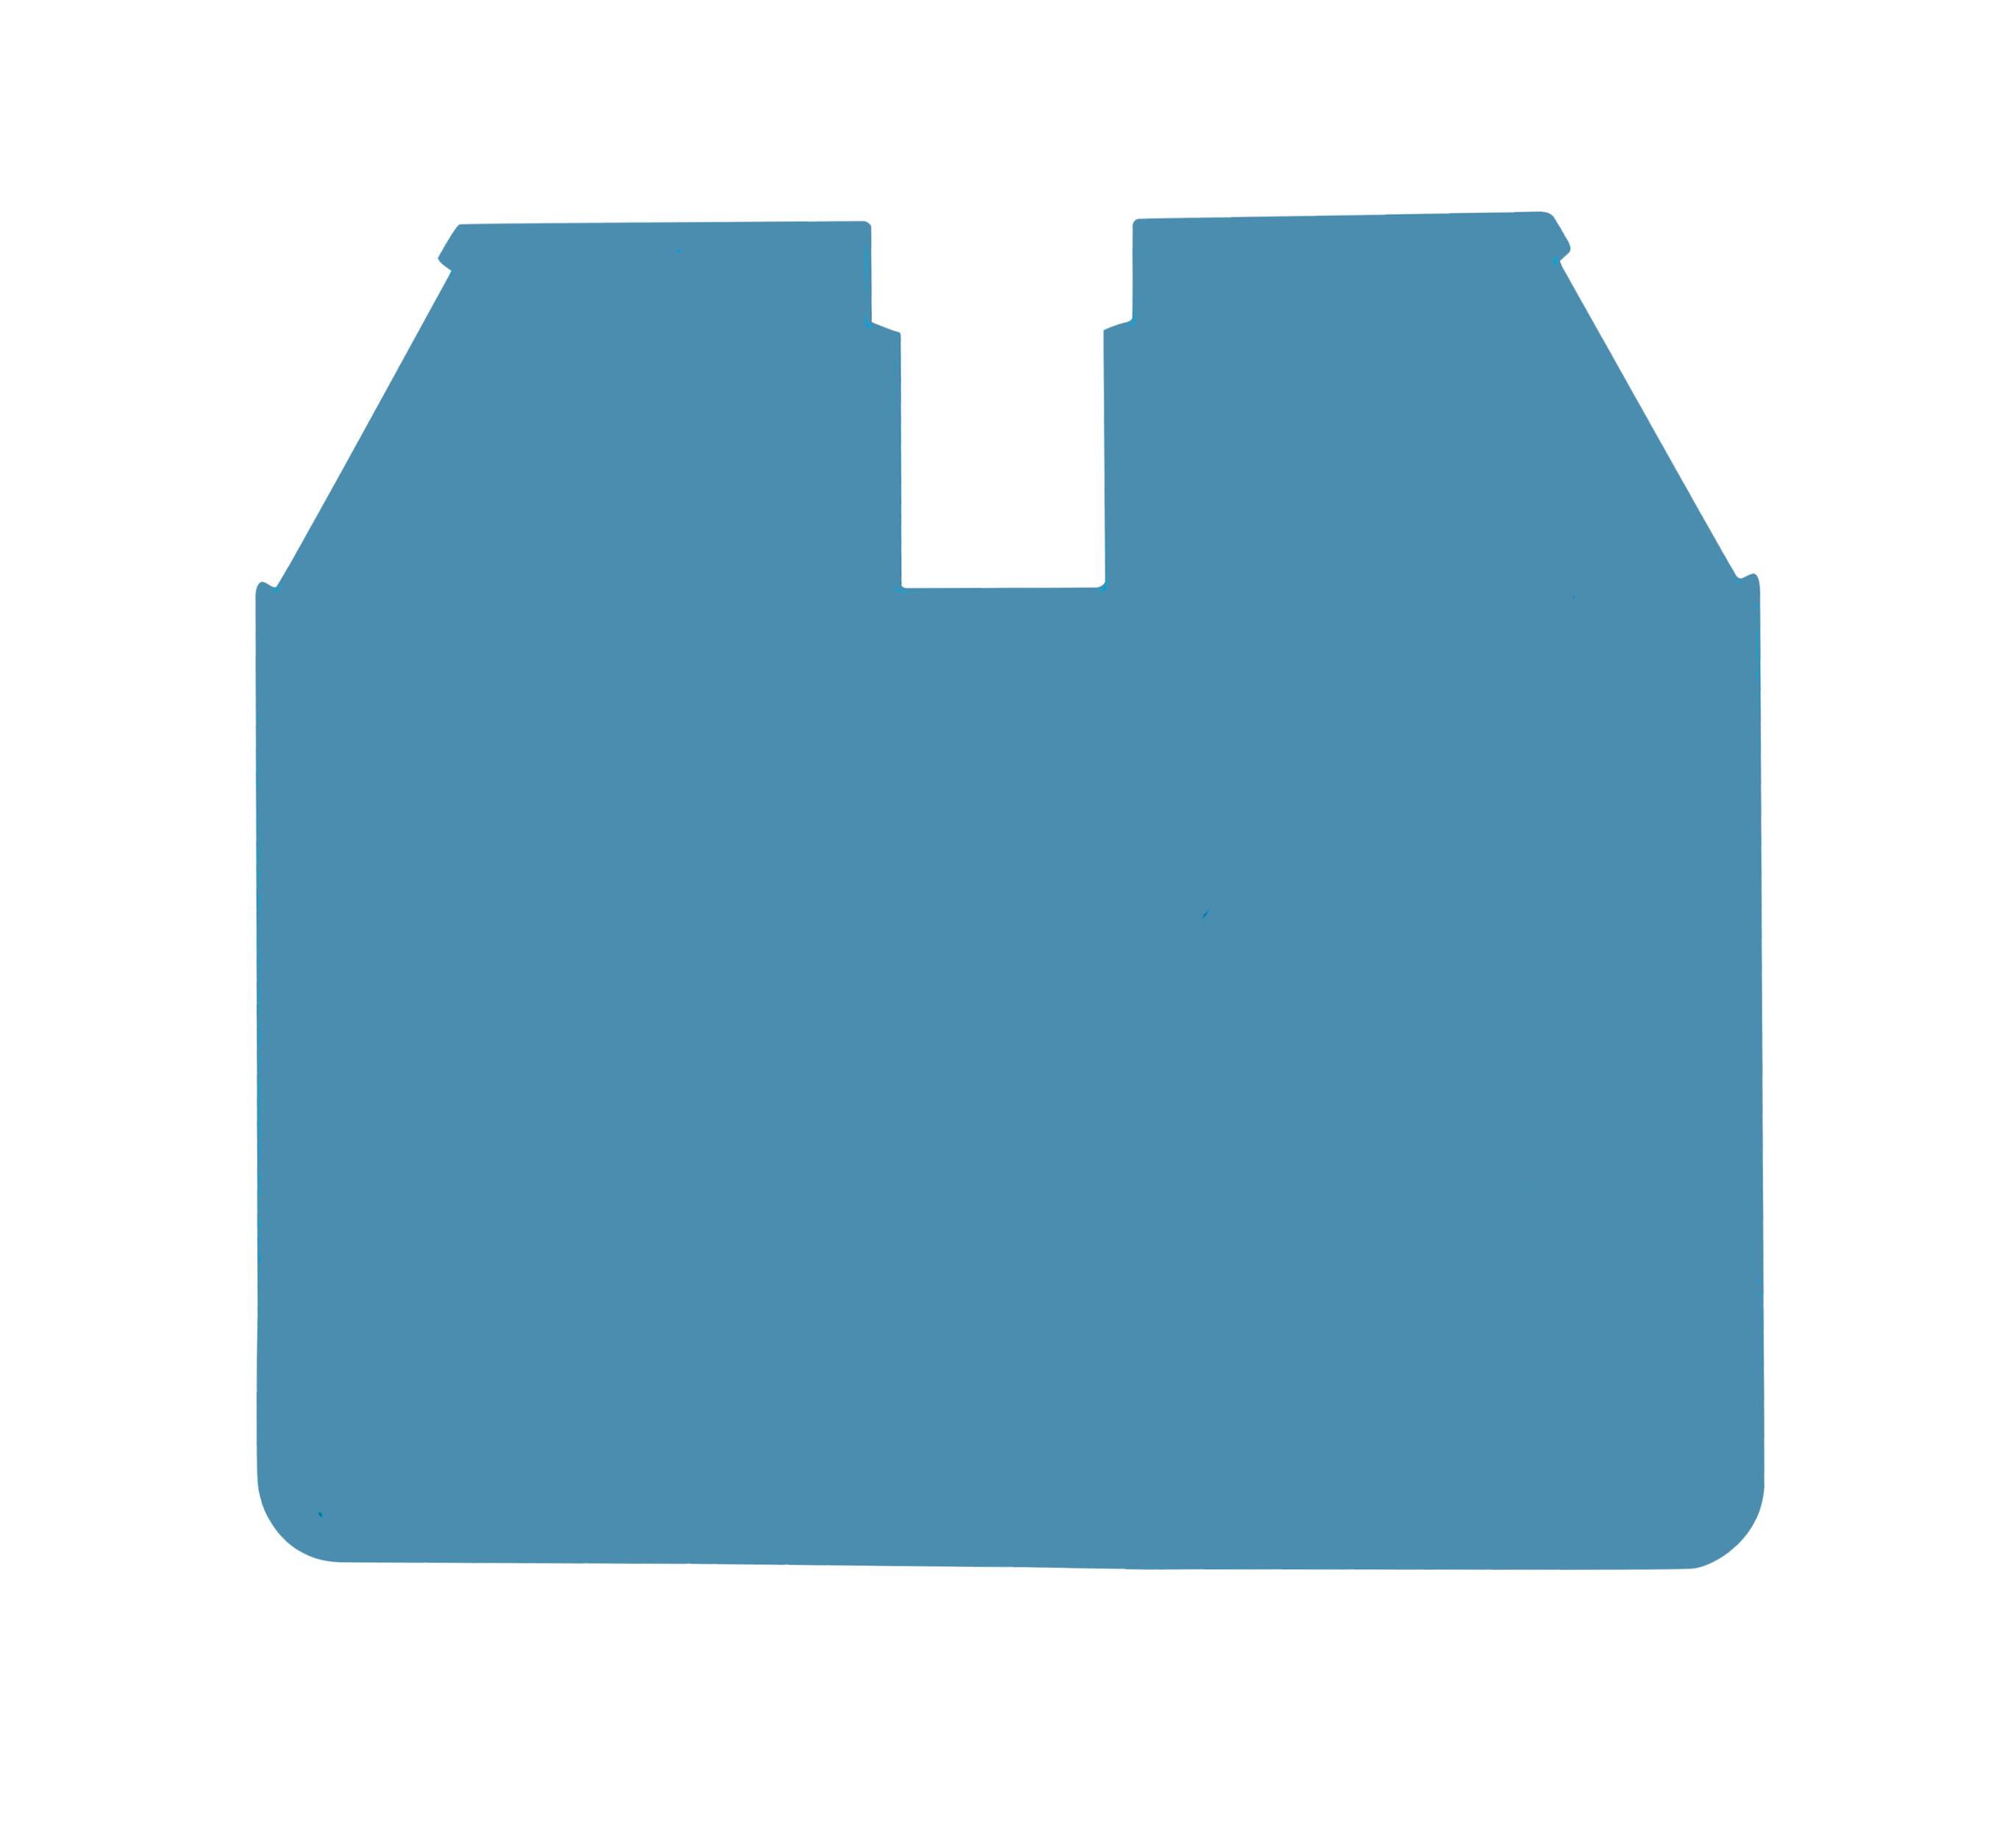 1 Stk Endplatte für 16mm² Klemmen, Type AVK 16 RD, blau IK601216-A